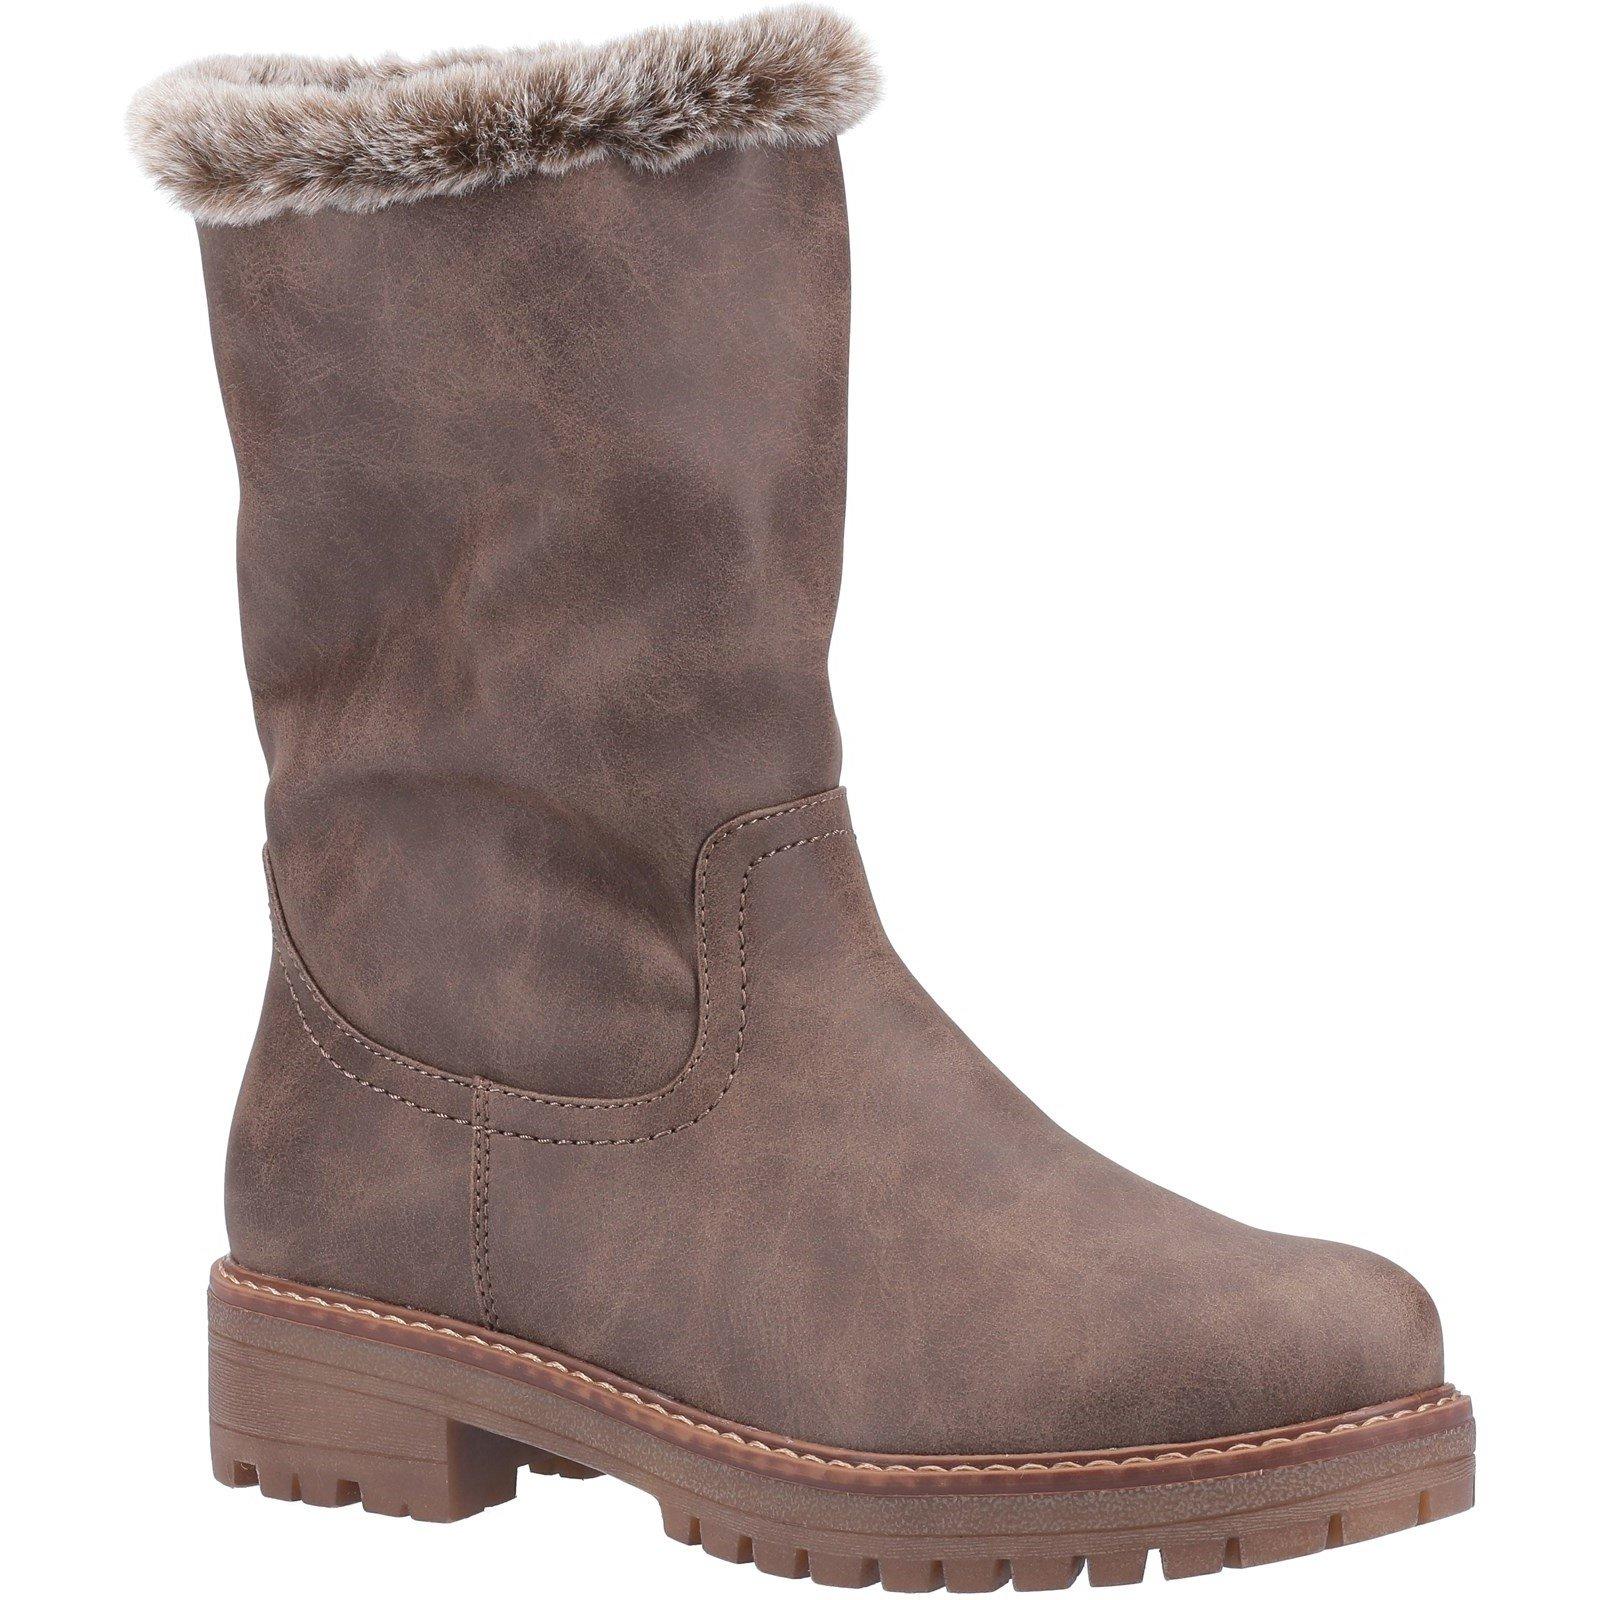 Divaz Women's Nadia Fur Lined Boot Various Colours 33025 - Brown 3